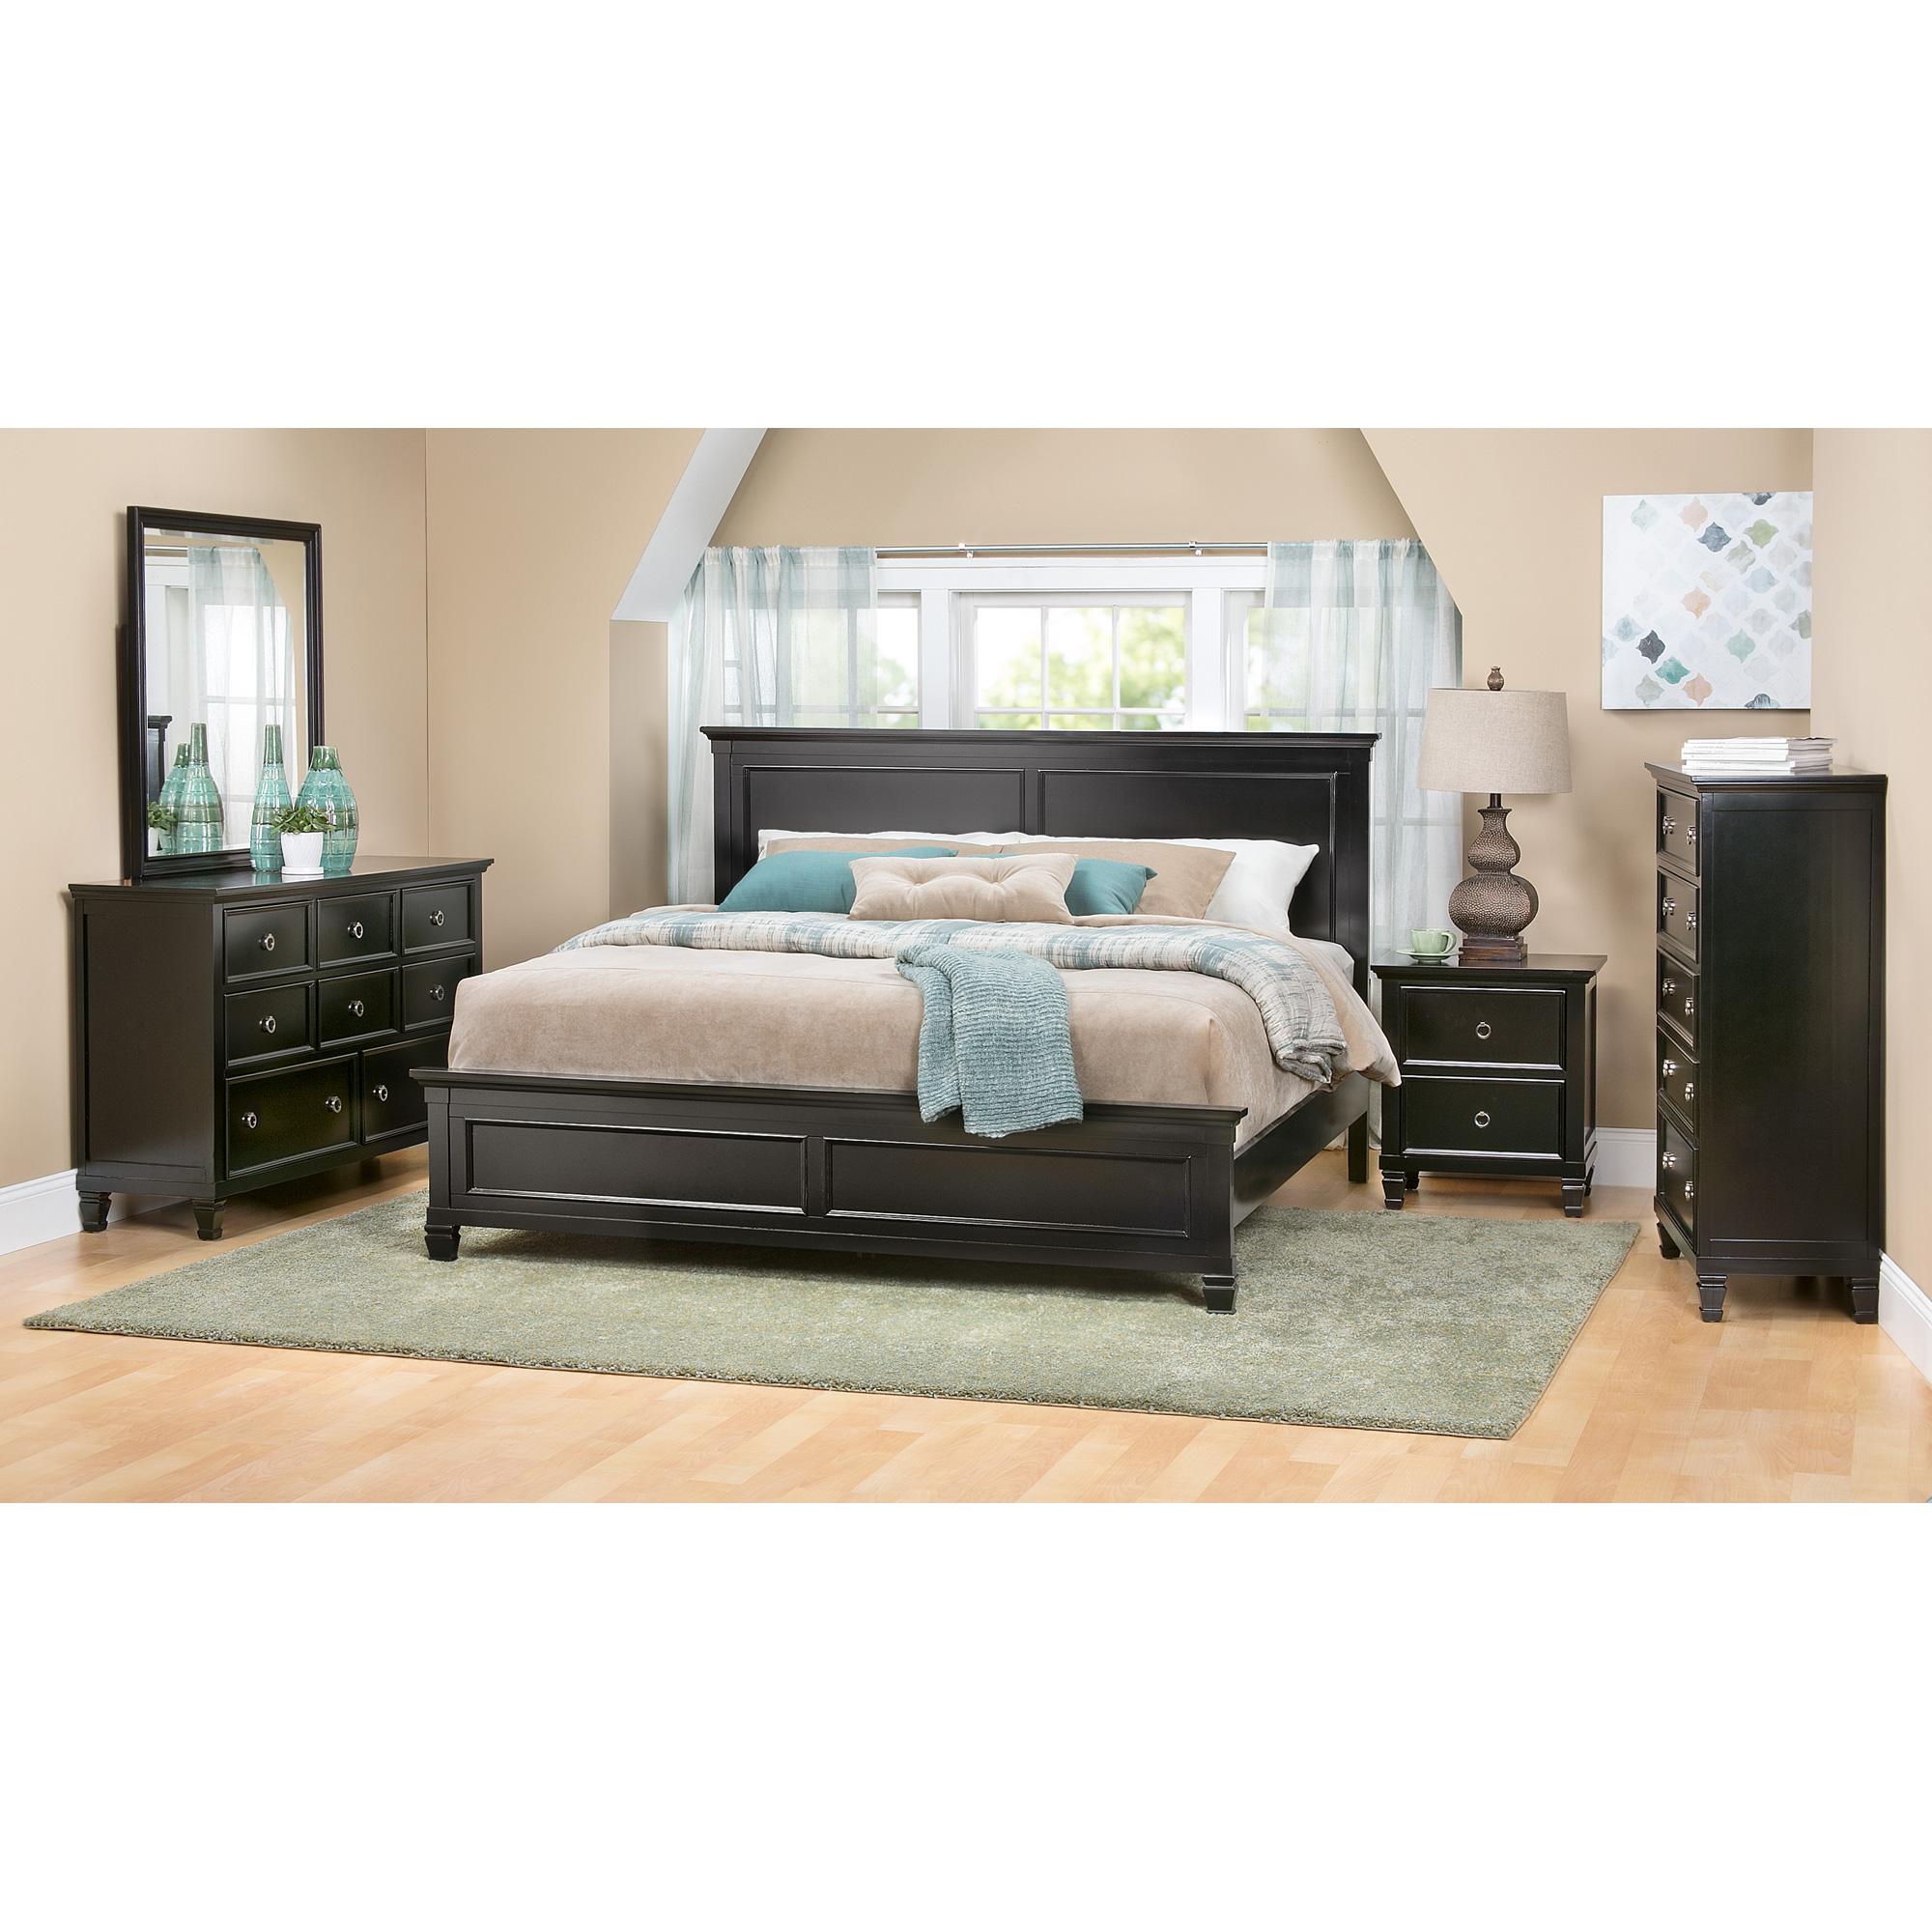 New Classic | Persia II Black King 4 Piece Room Group Bedroom Set